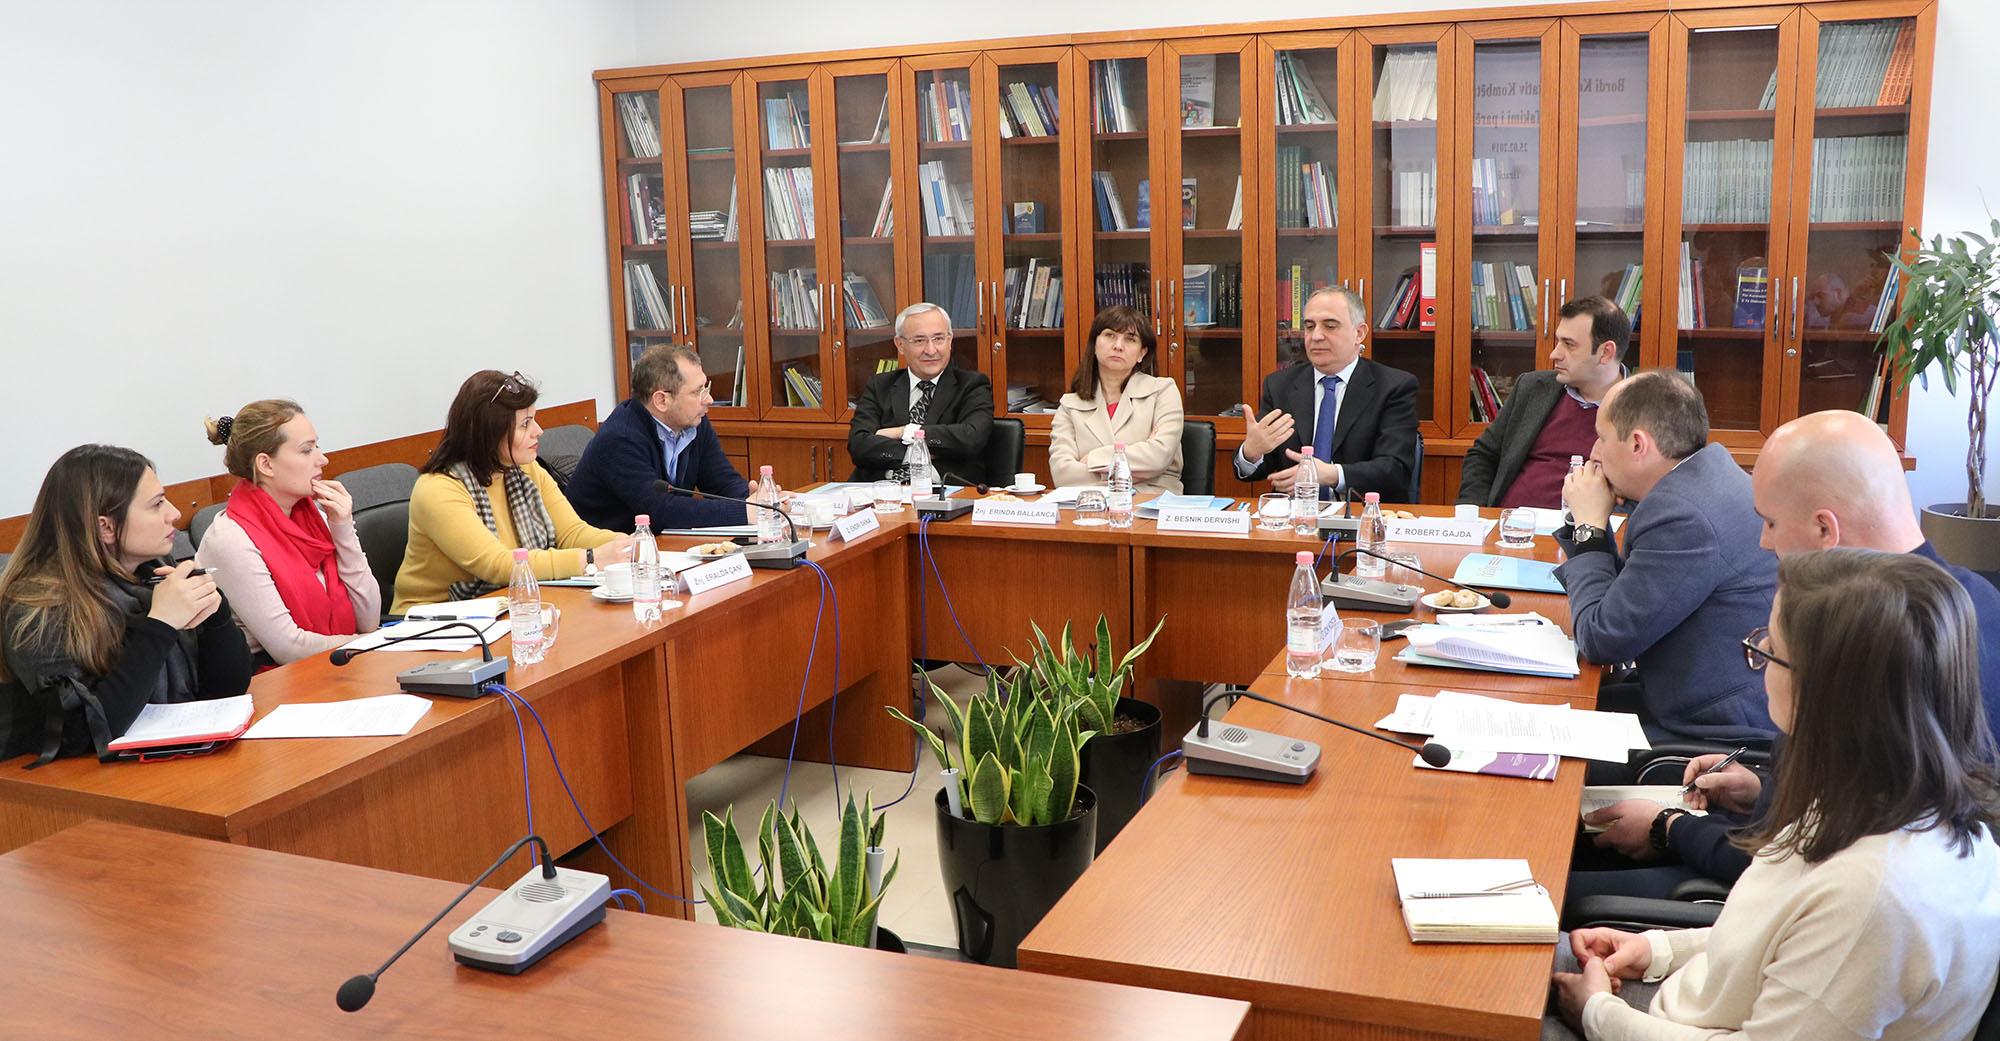 ICDPPC – Tirana 2019: première réunion du Comité consultatif national